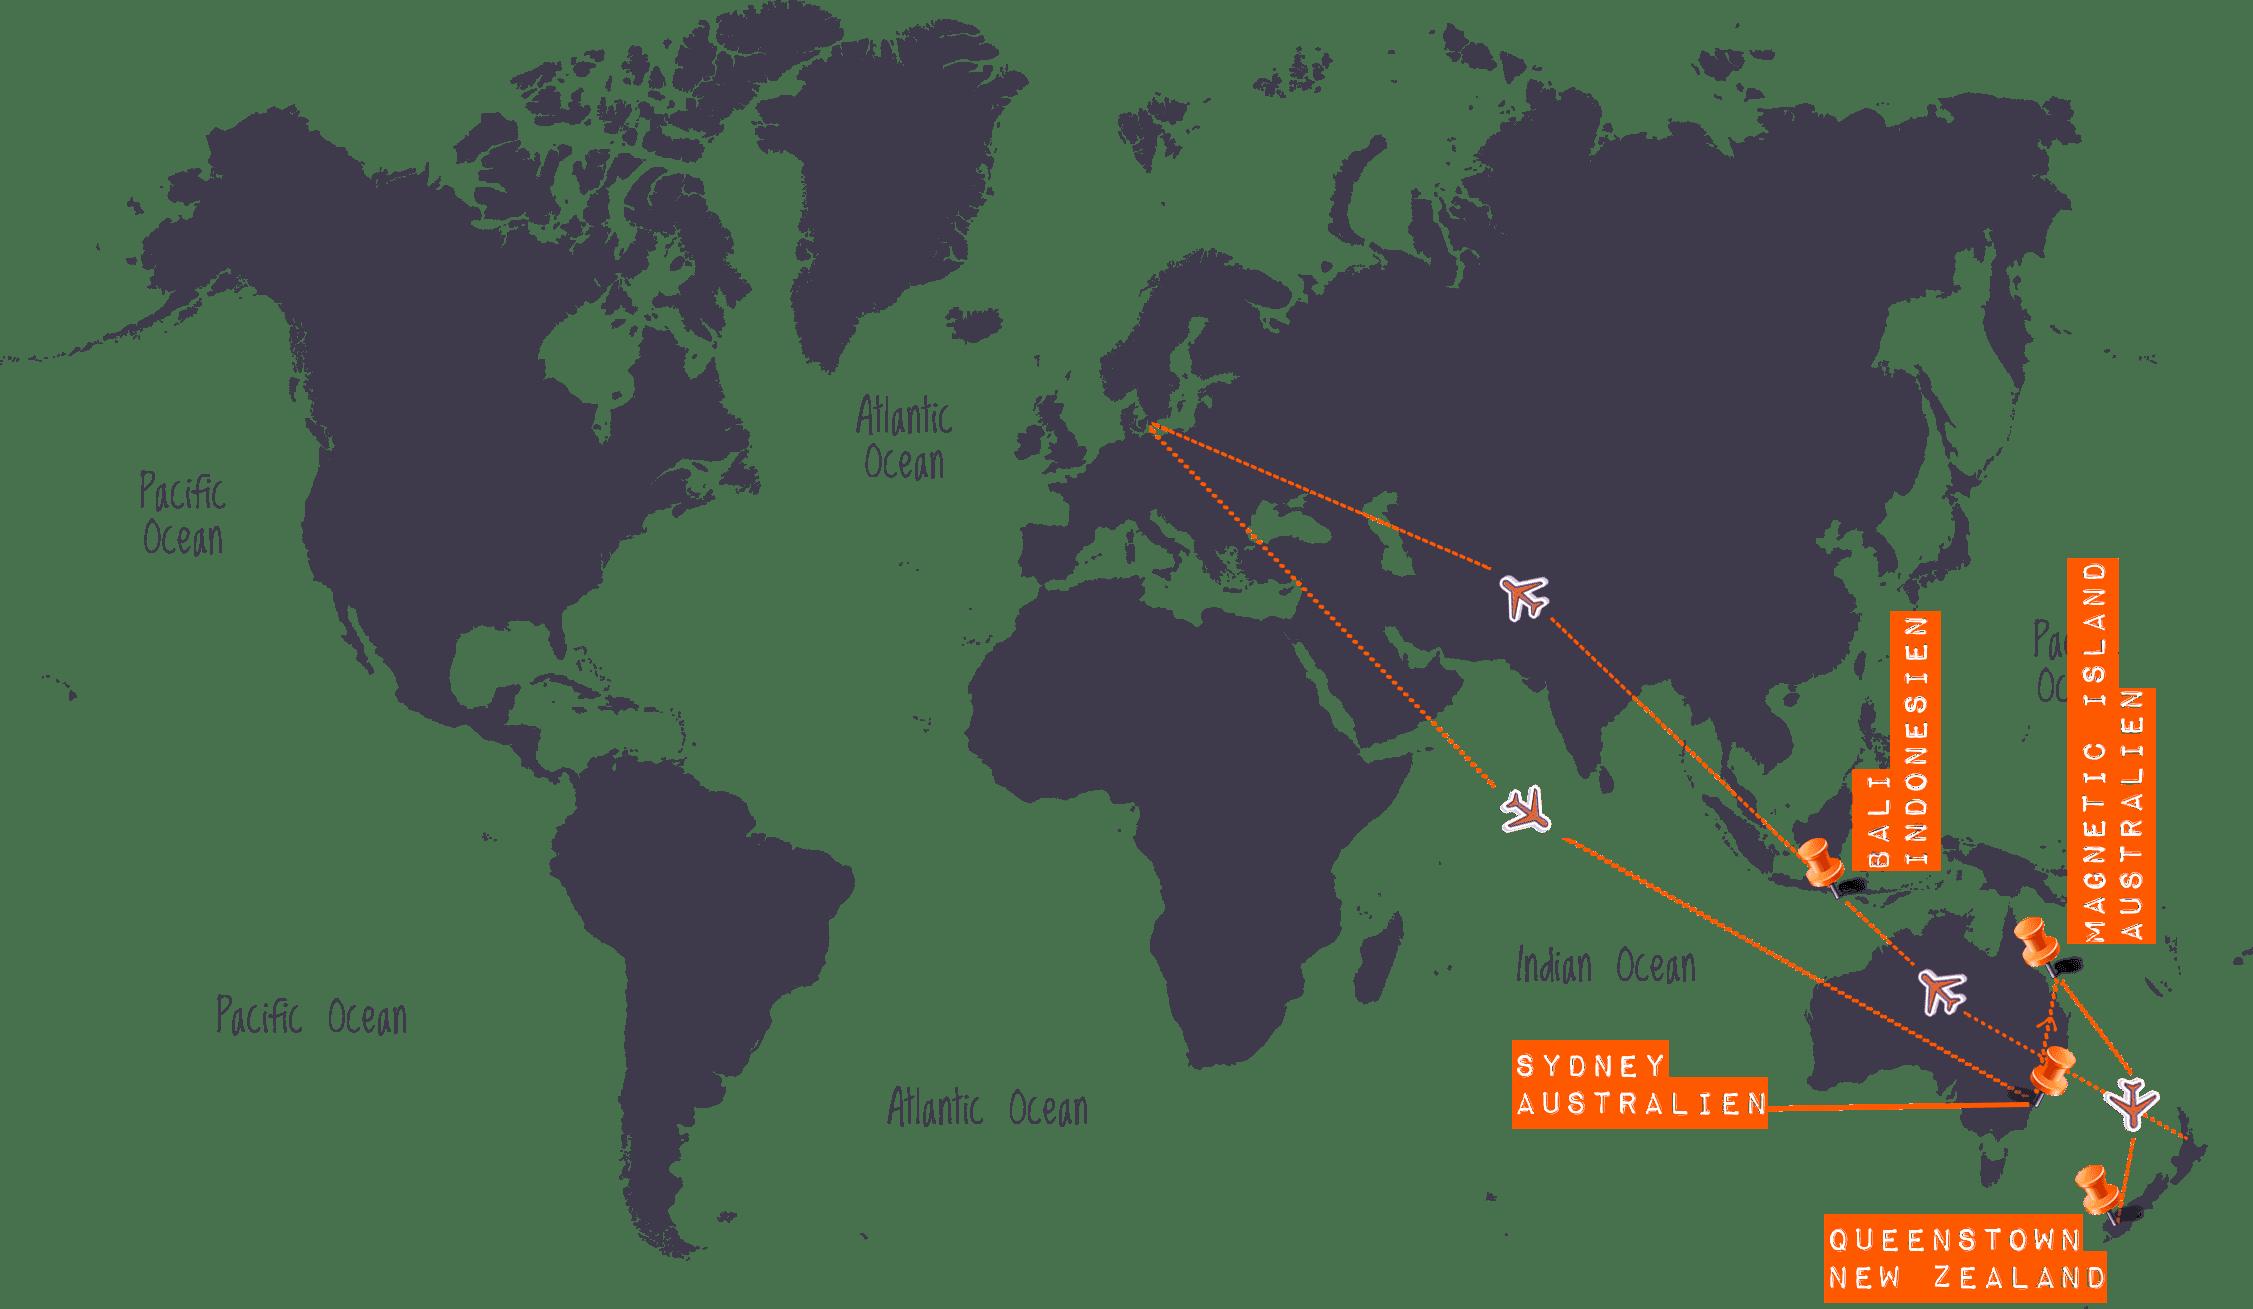 Højskole i Australien, New Zealand, Bali & Gili